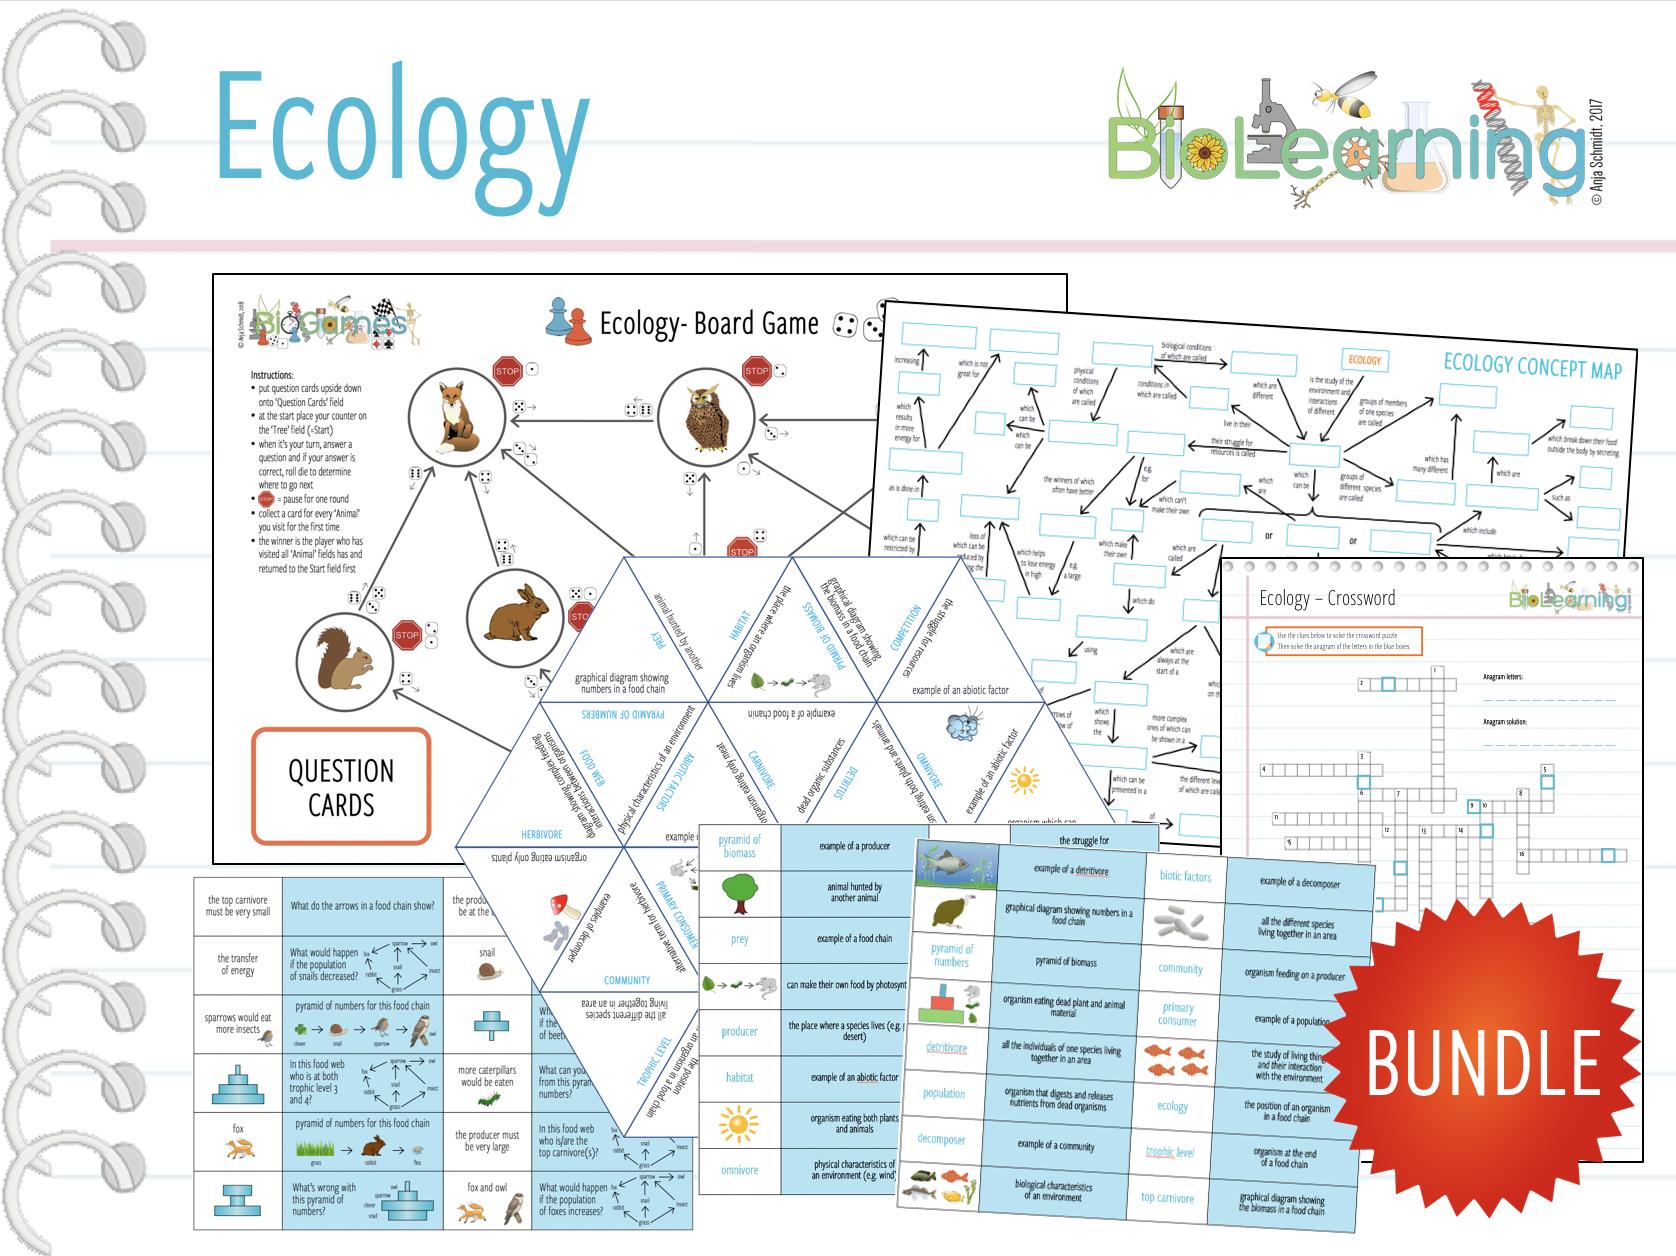 Ecology - 6x Activities (KS3/KS4)